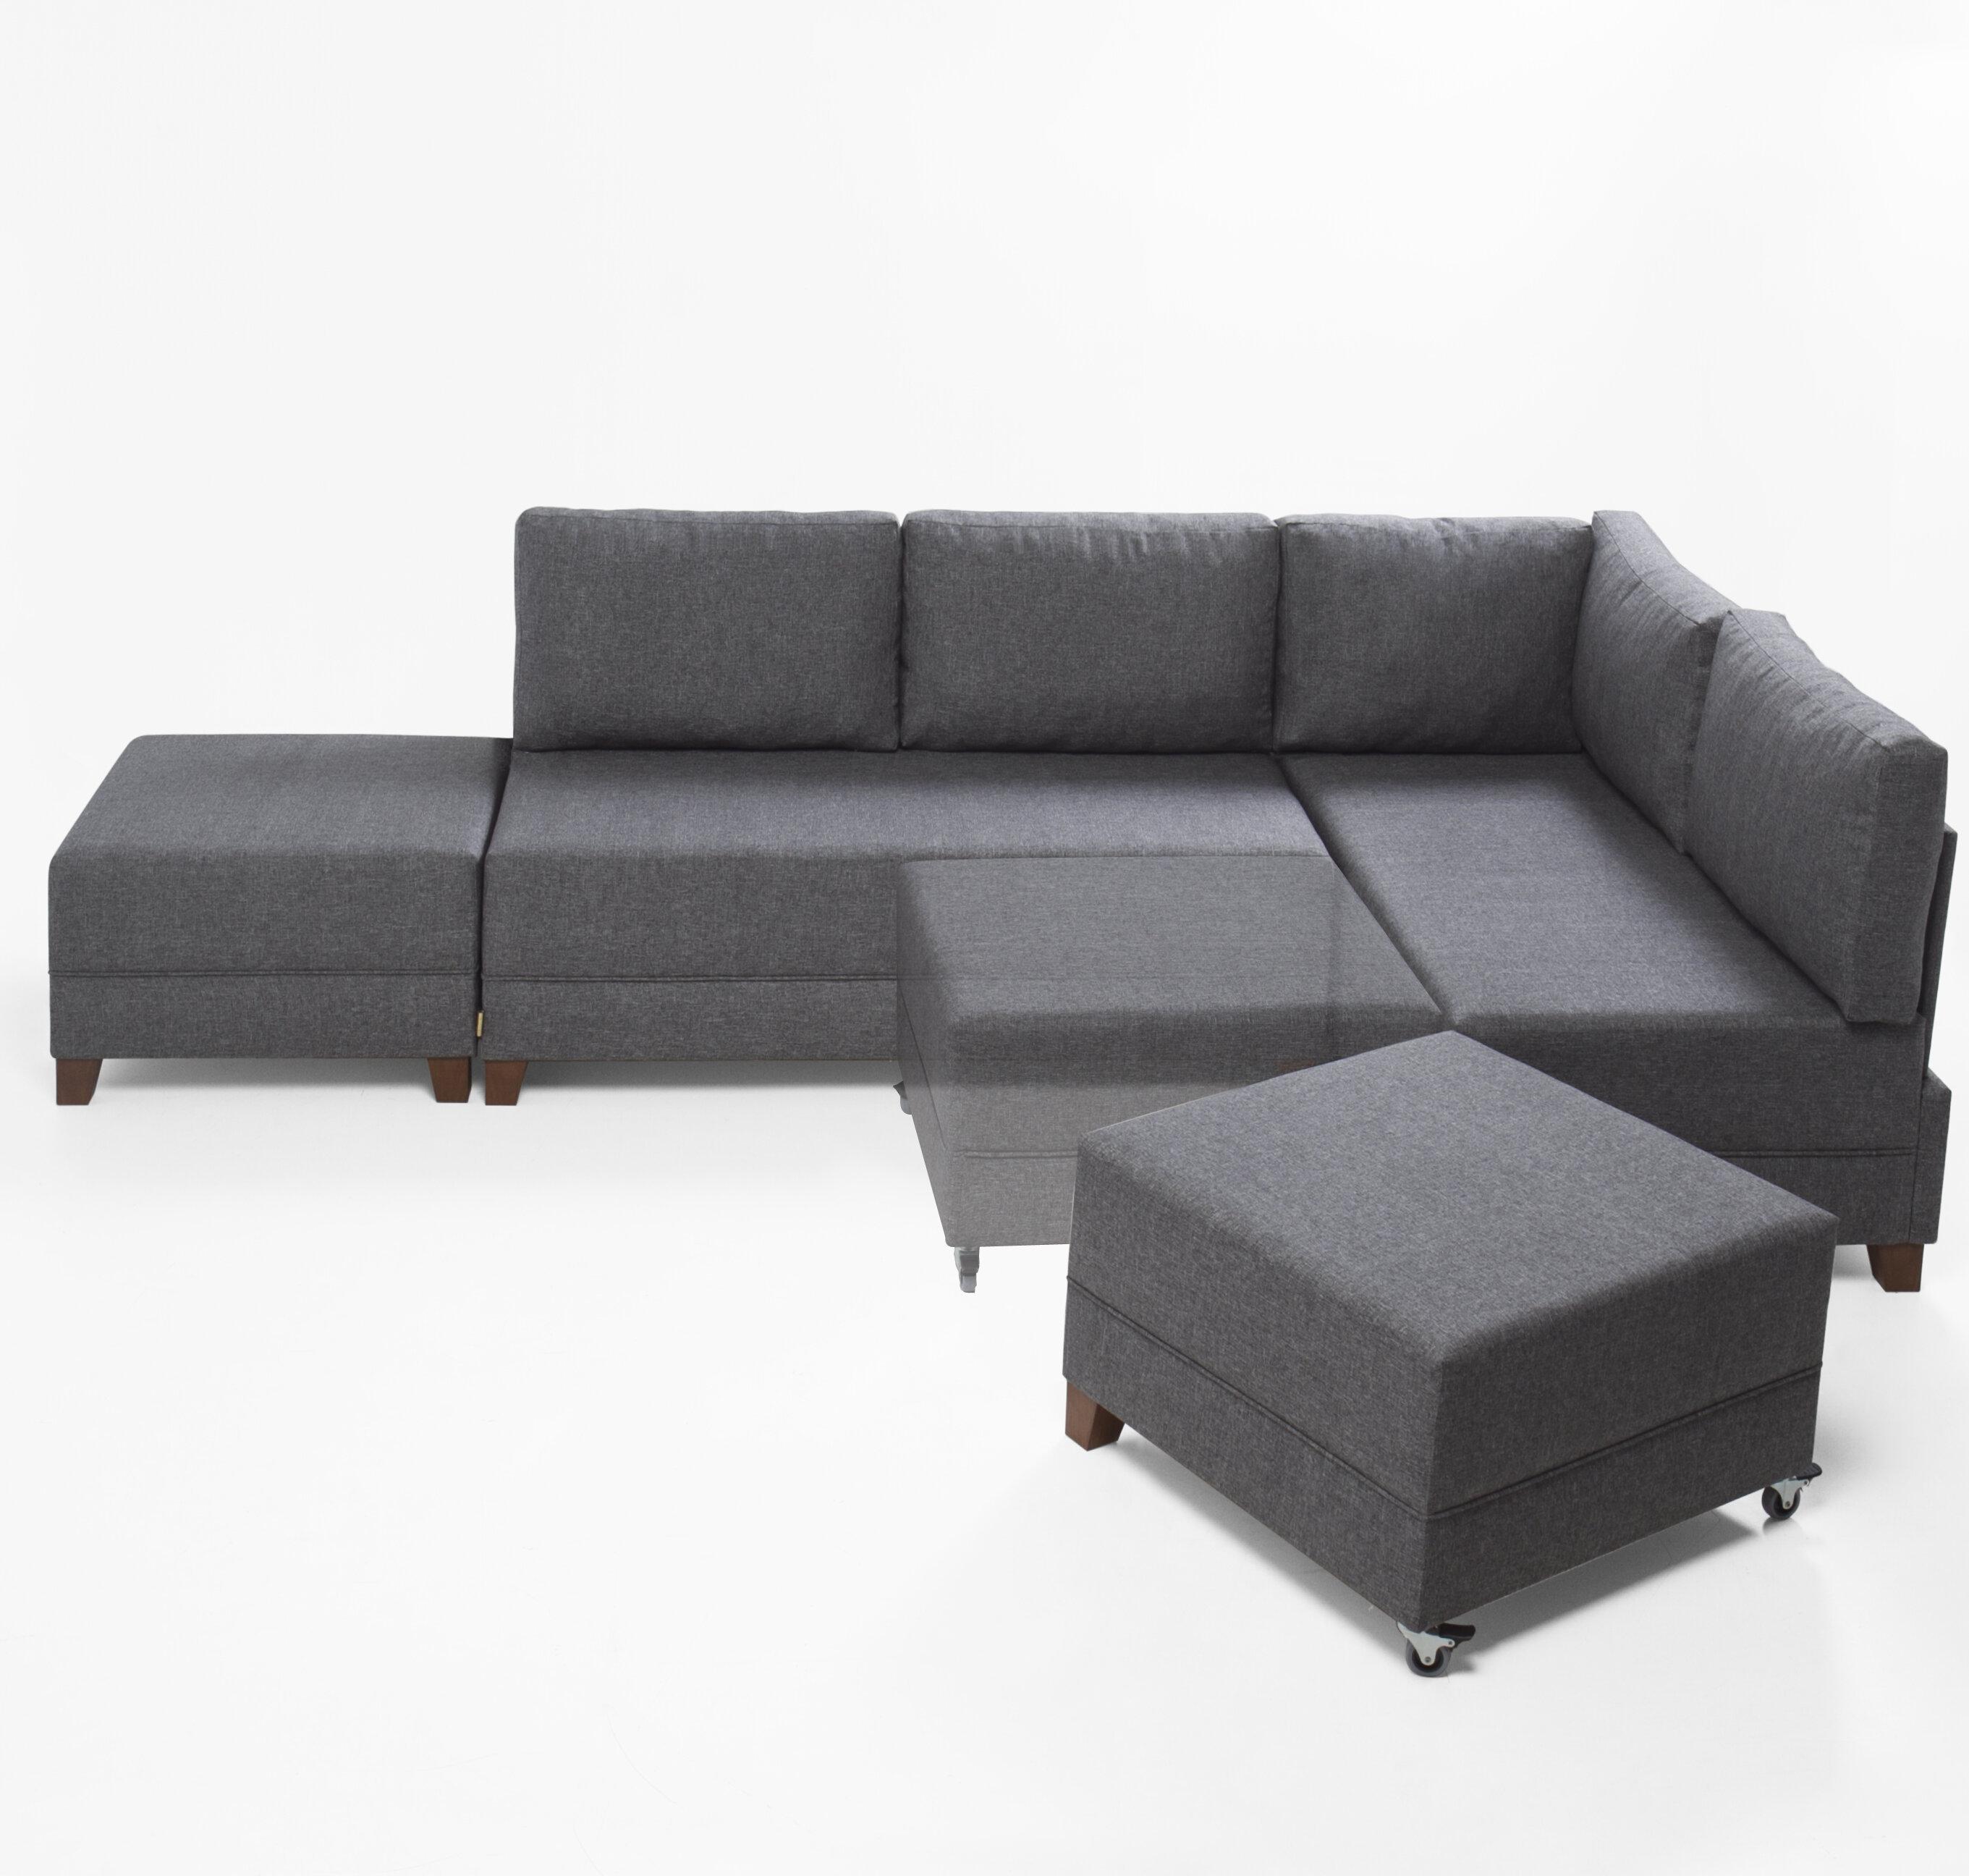 sectional leather storage sleeper faux team futon dhp free l hartford black